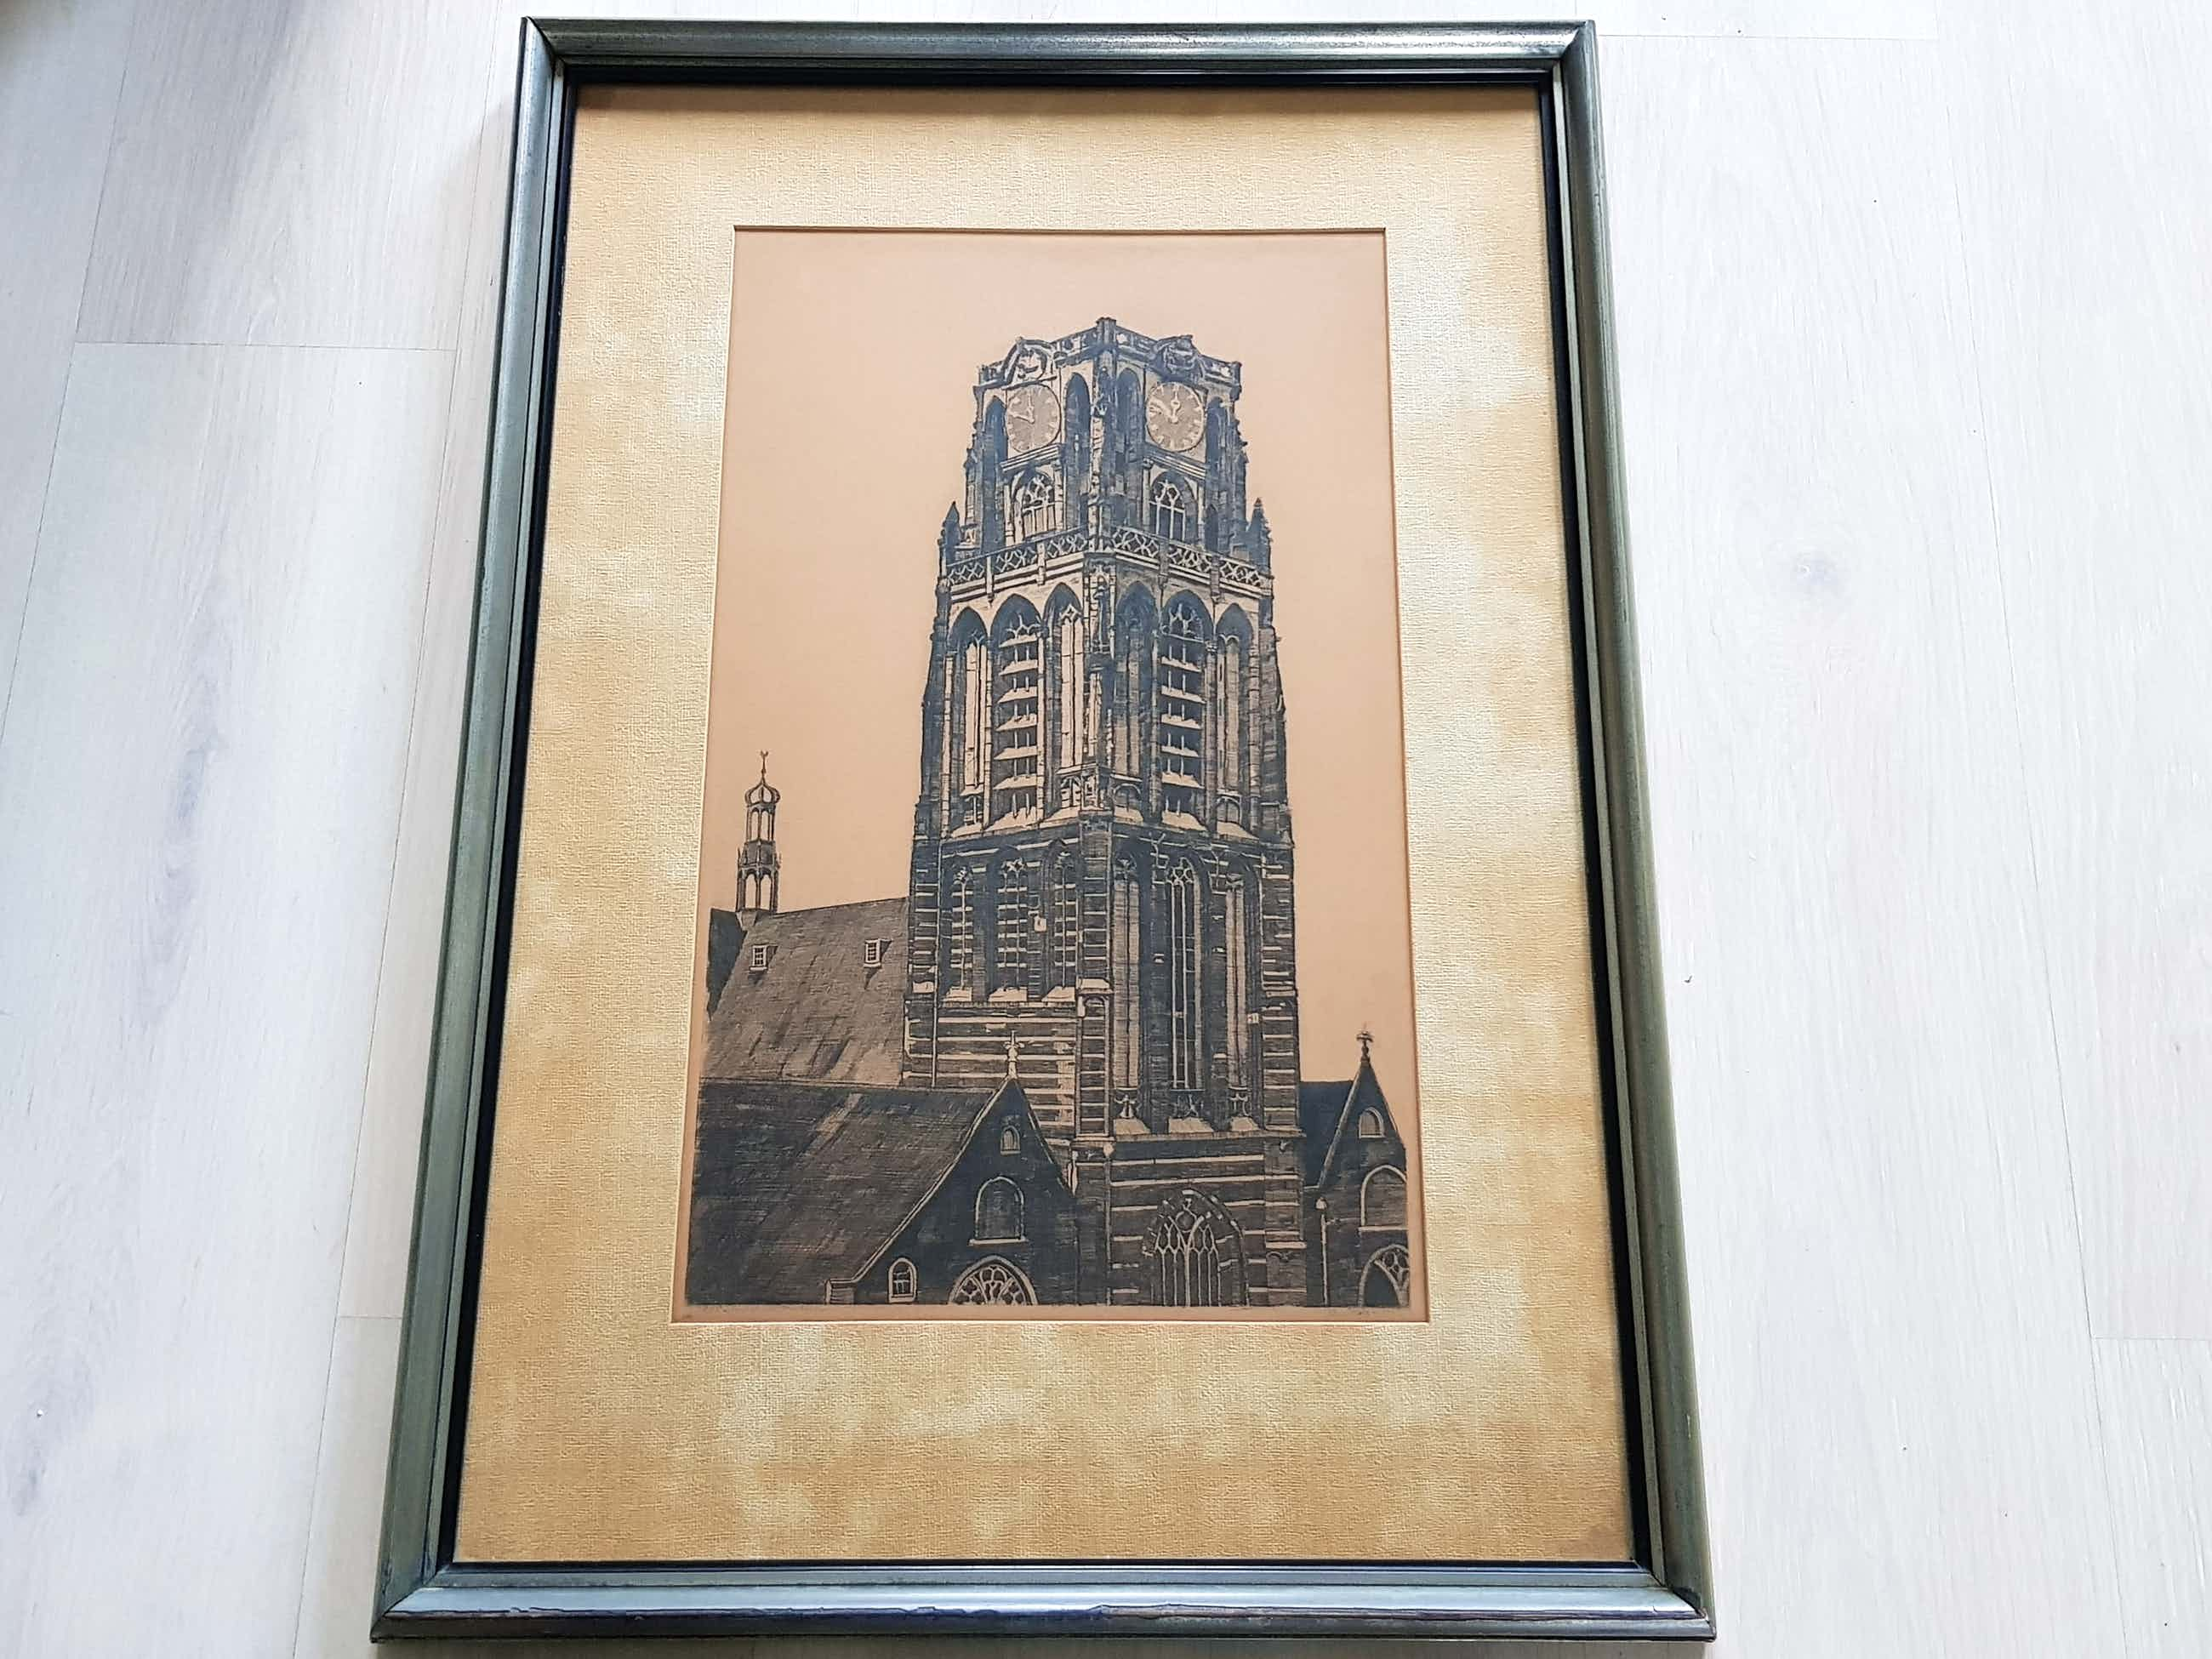 Jan Sirks - St. Laurenstoren, Rotterdam kopen? Bied vanaf 35!